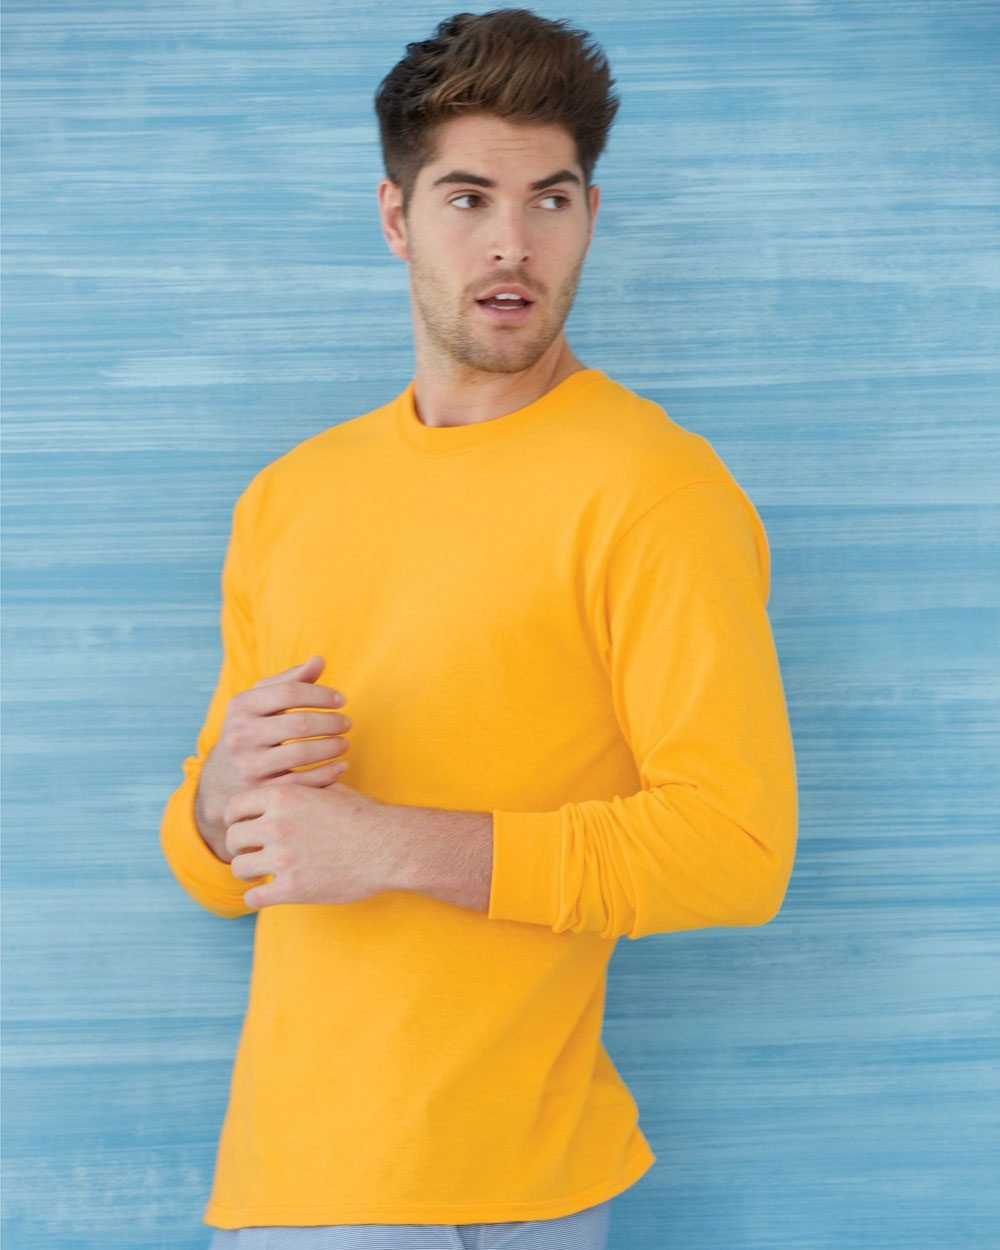 7eff3e27 Gildan Heavy Cotton™ 5.3 oz. Long-Sleeve T-Shirt G540 - Evan Webster INK